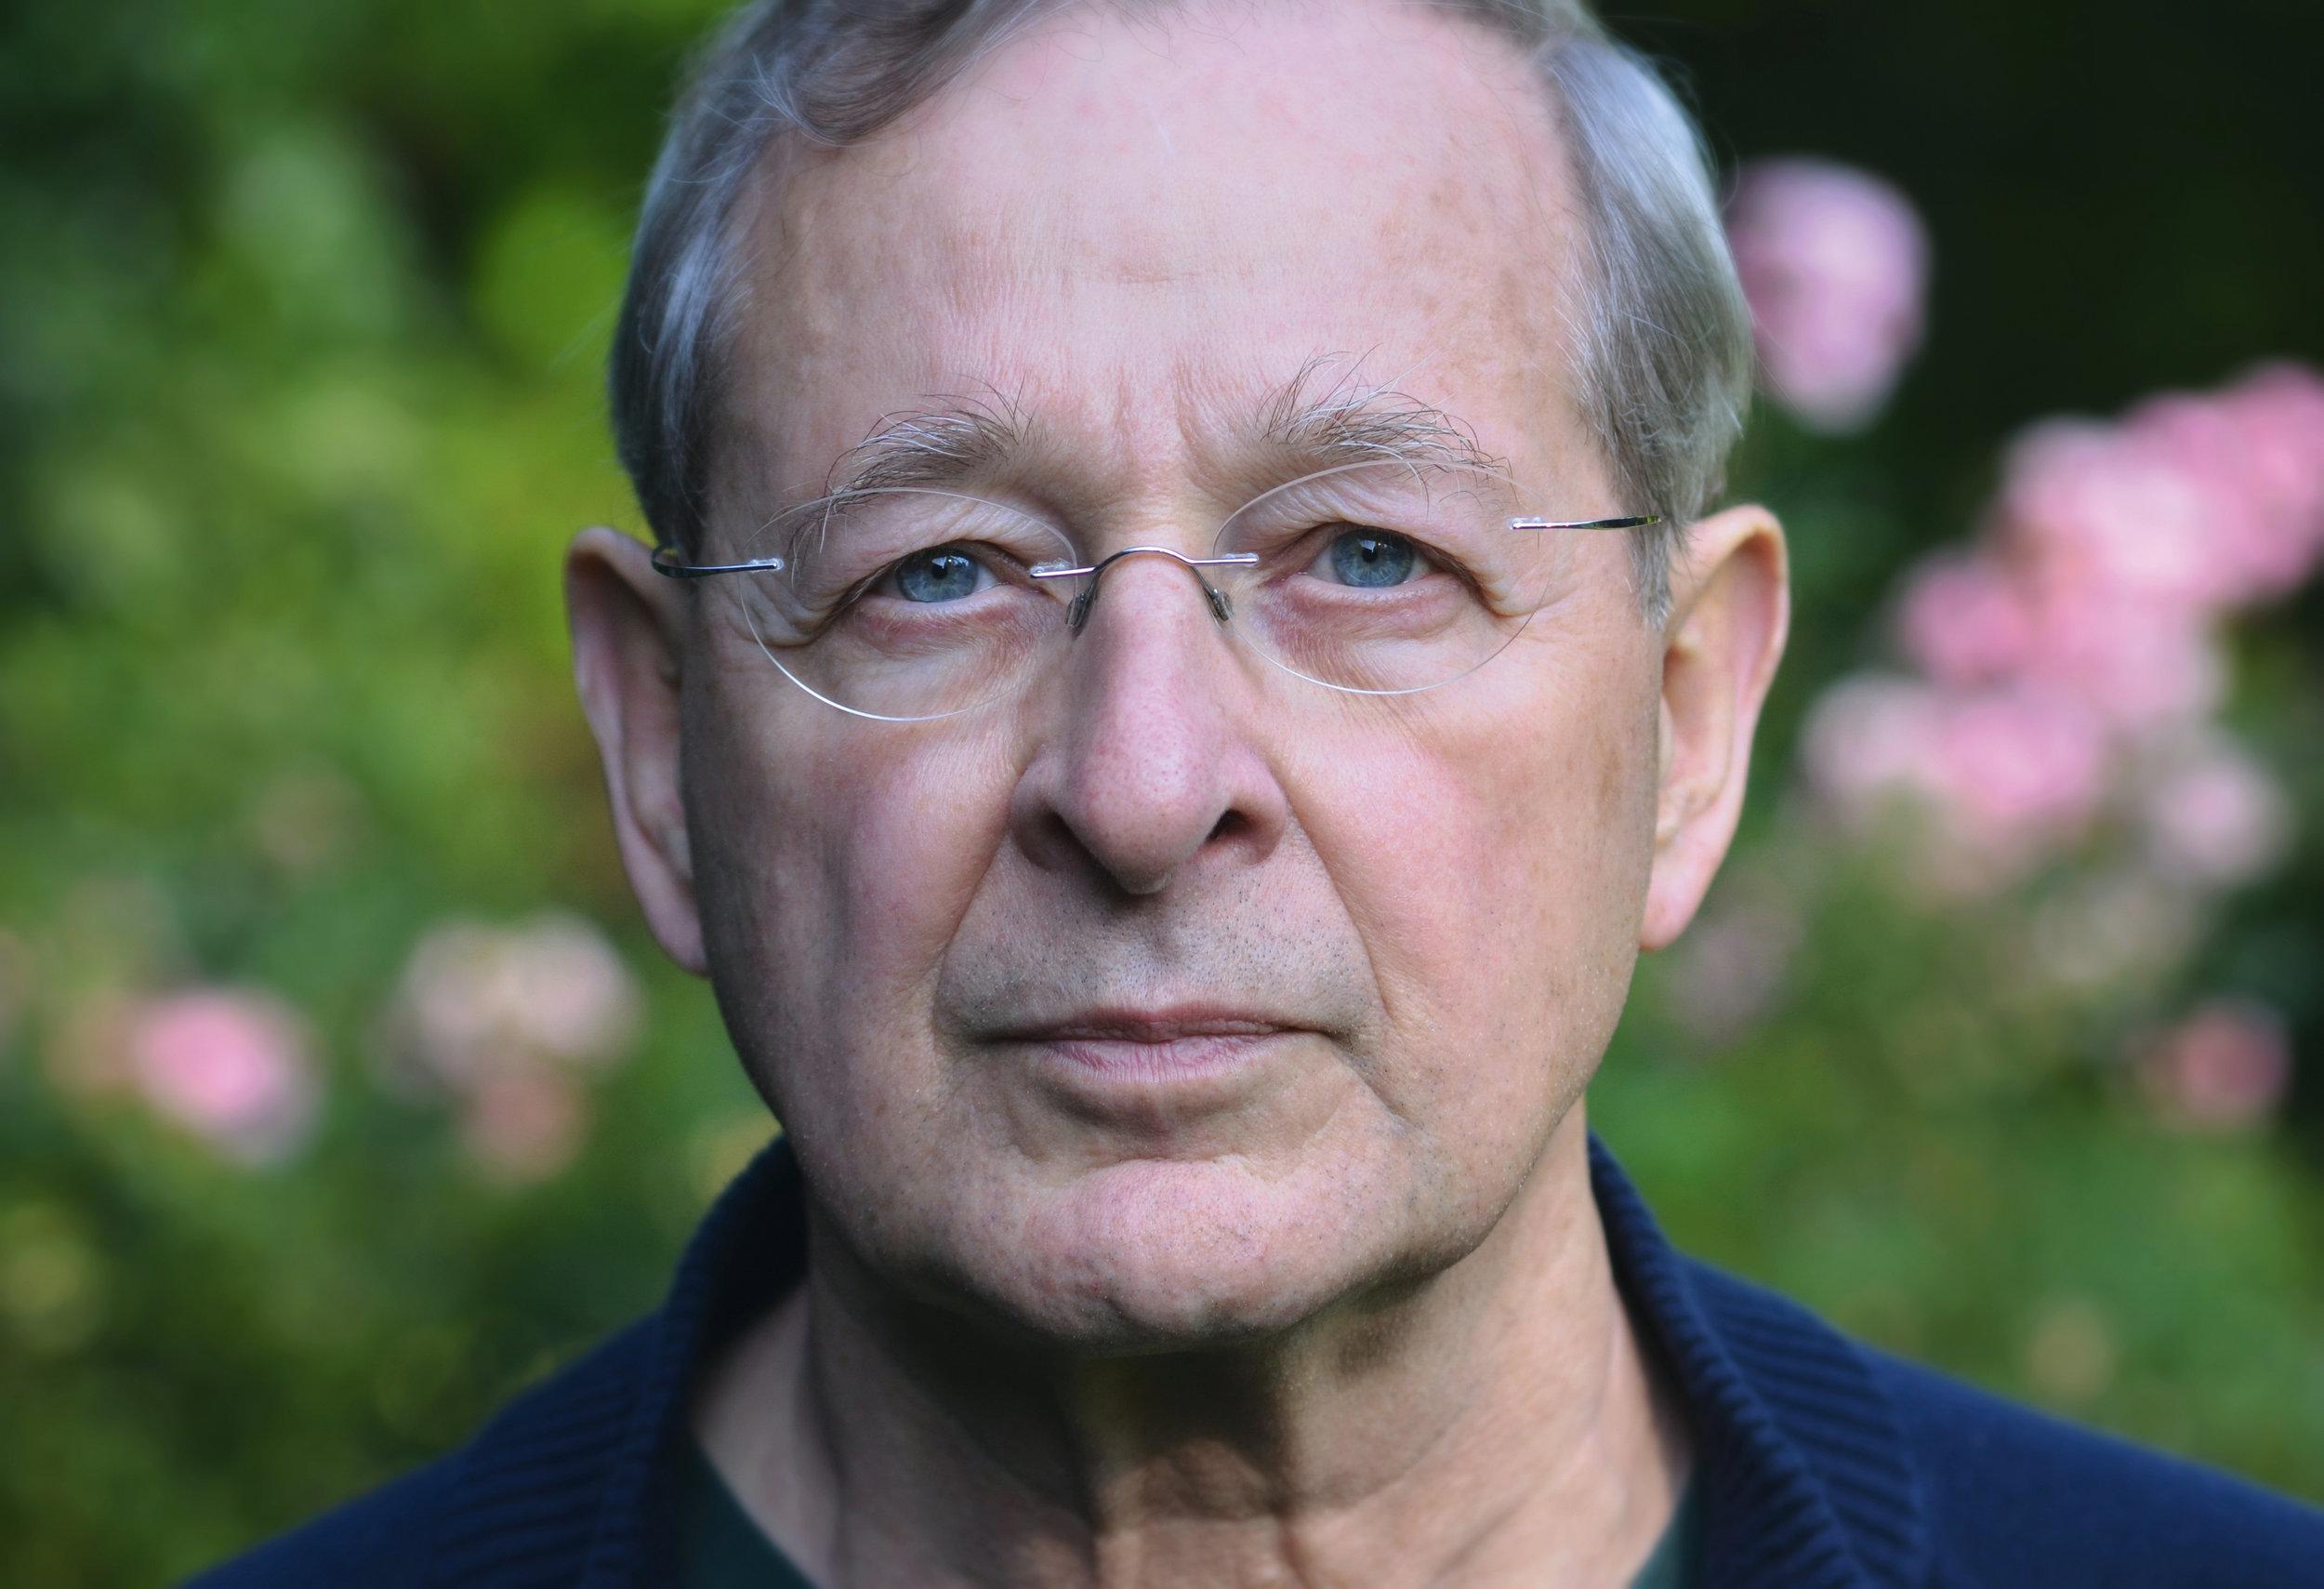 Péter Nádas, Foto: Gáspár Stekovics